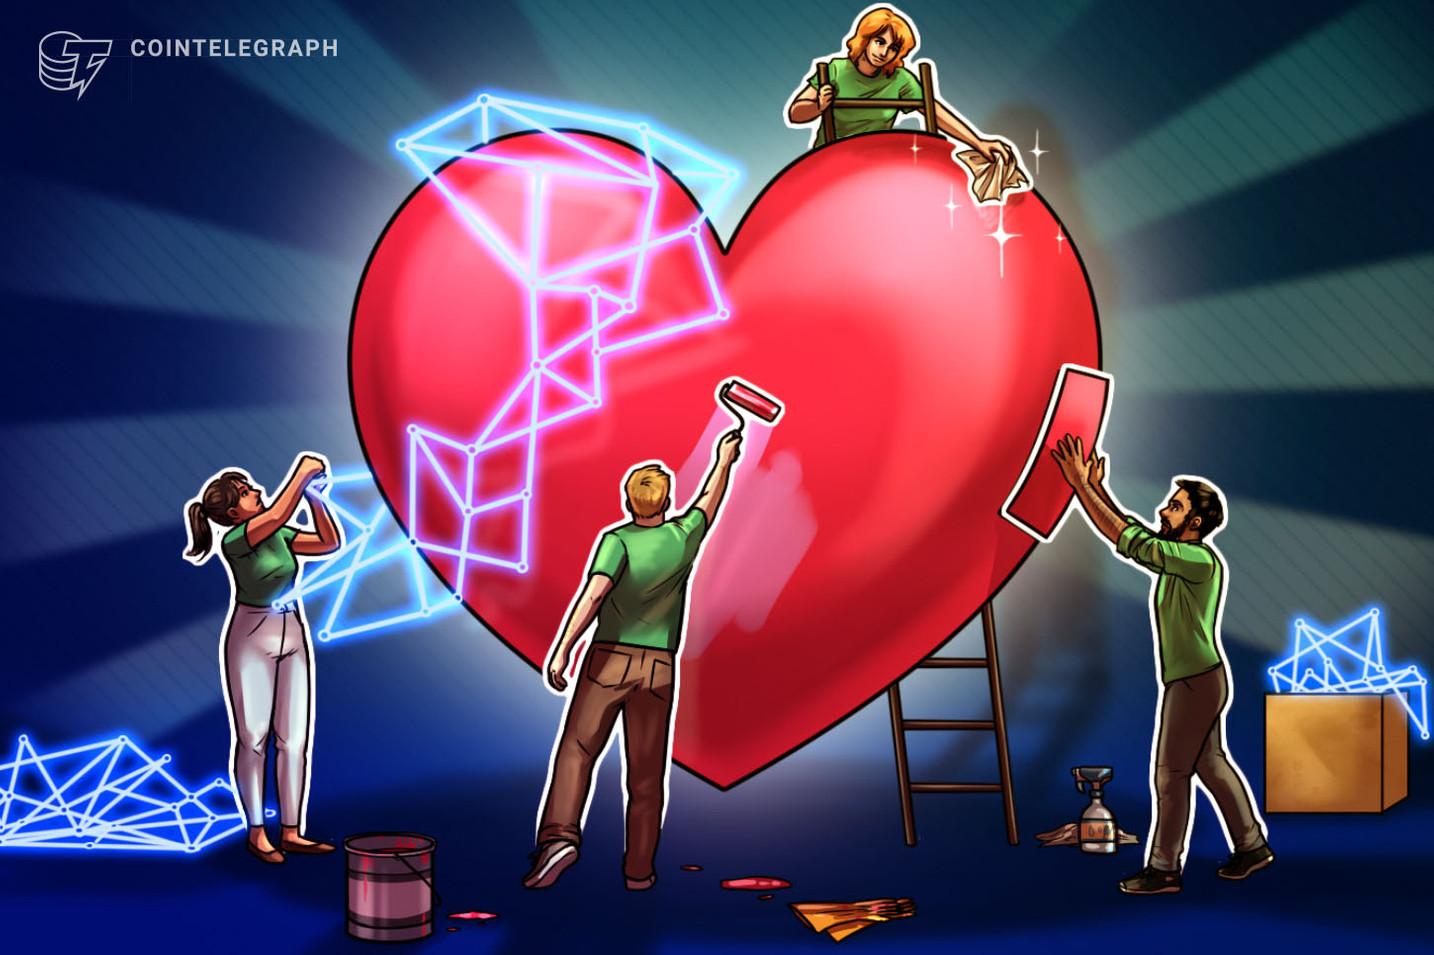 《【区块链上的鲜血】区块链上的鲜血:令牌化可以使捐赠更有效》